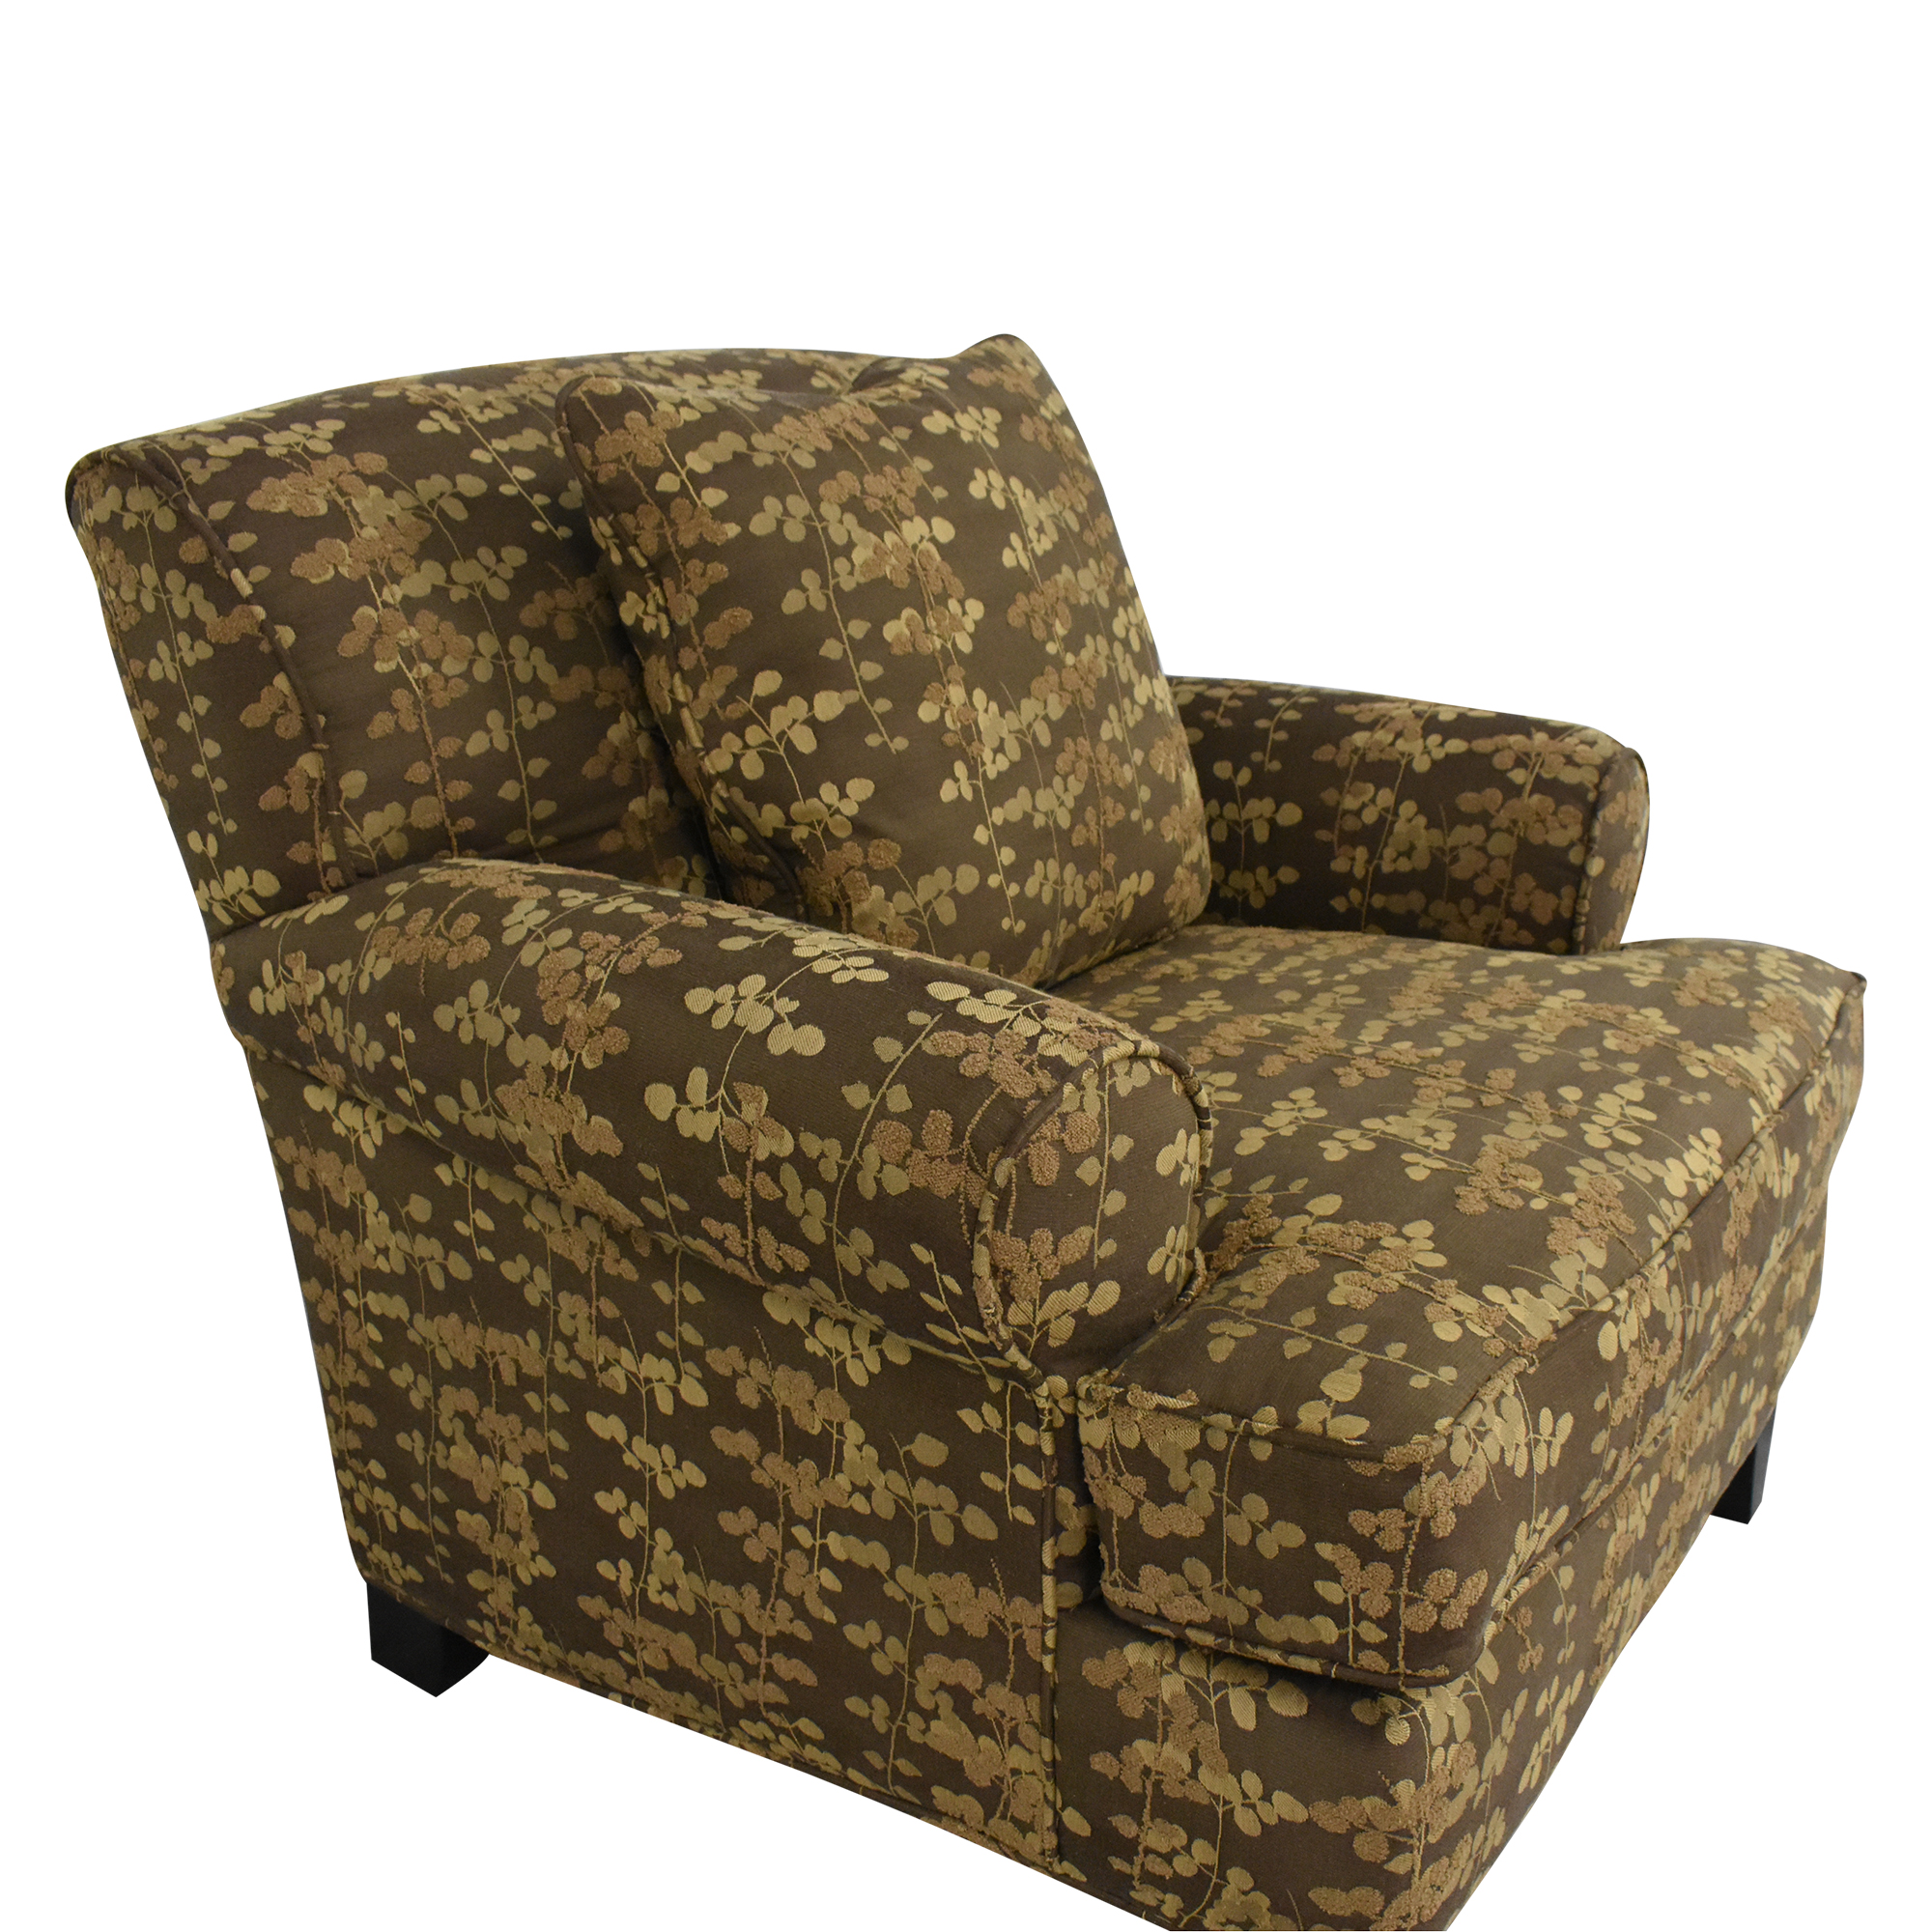 Macy's Macy's Roll Arm Club Chair second hand